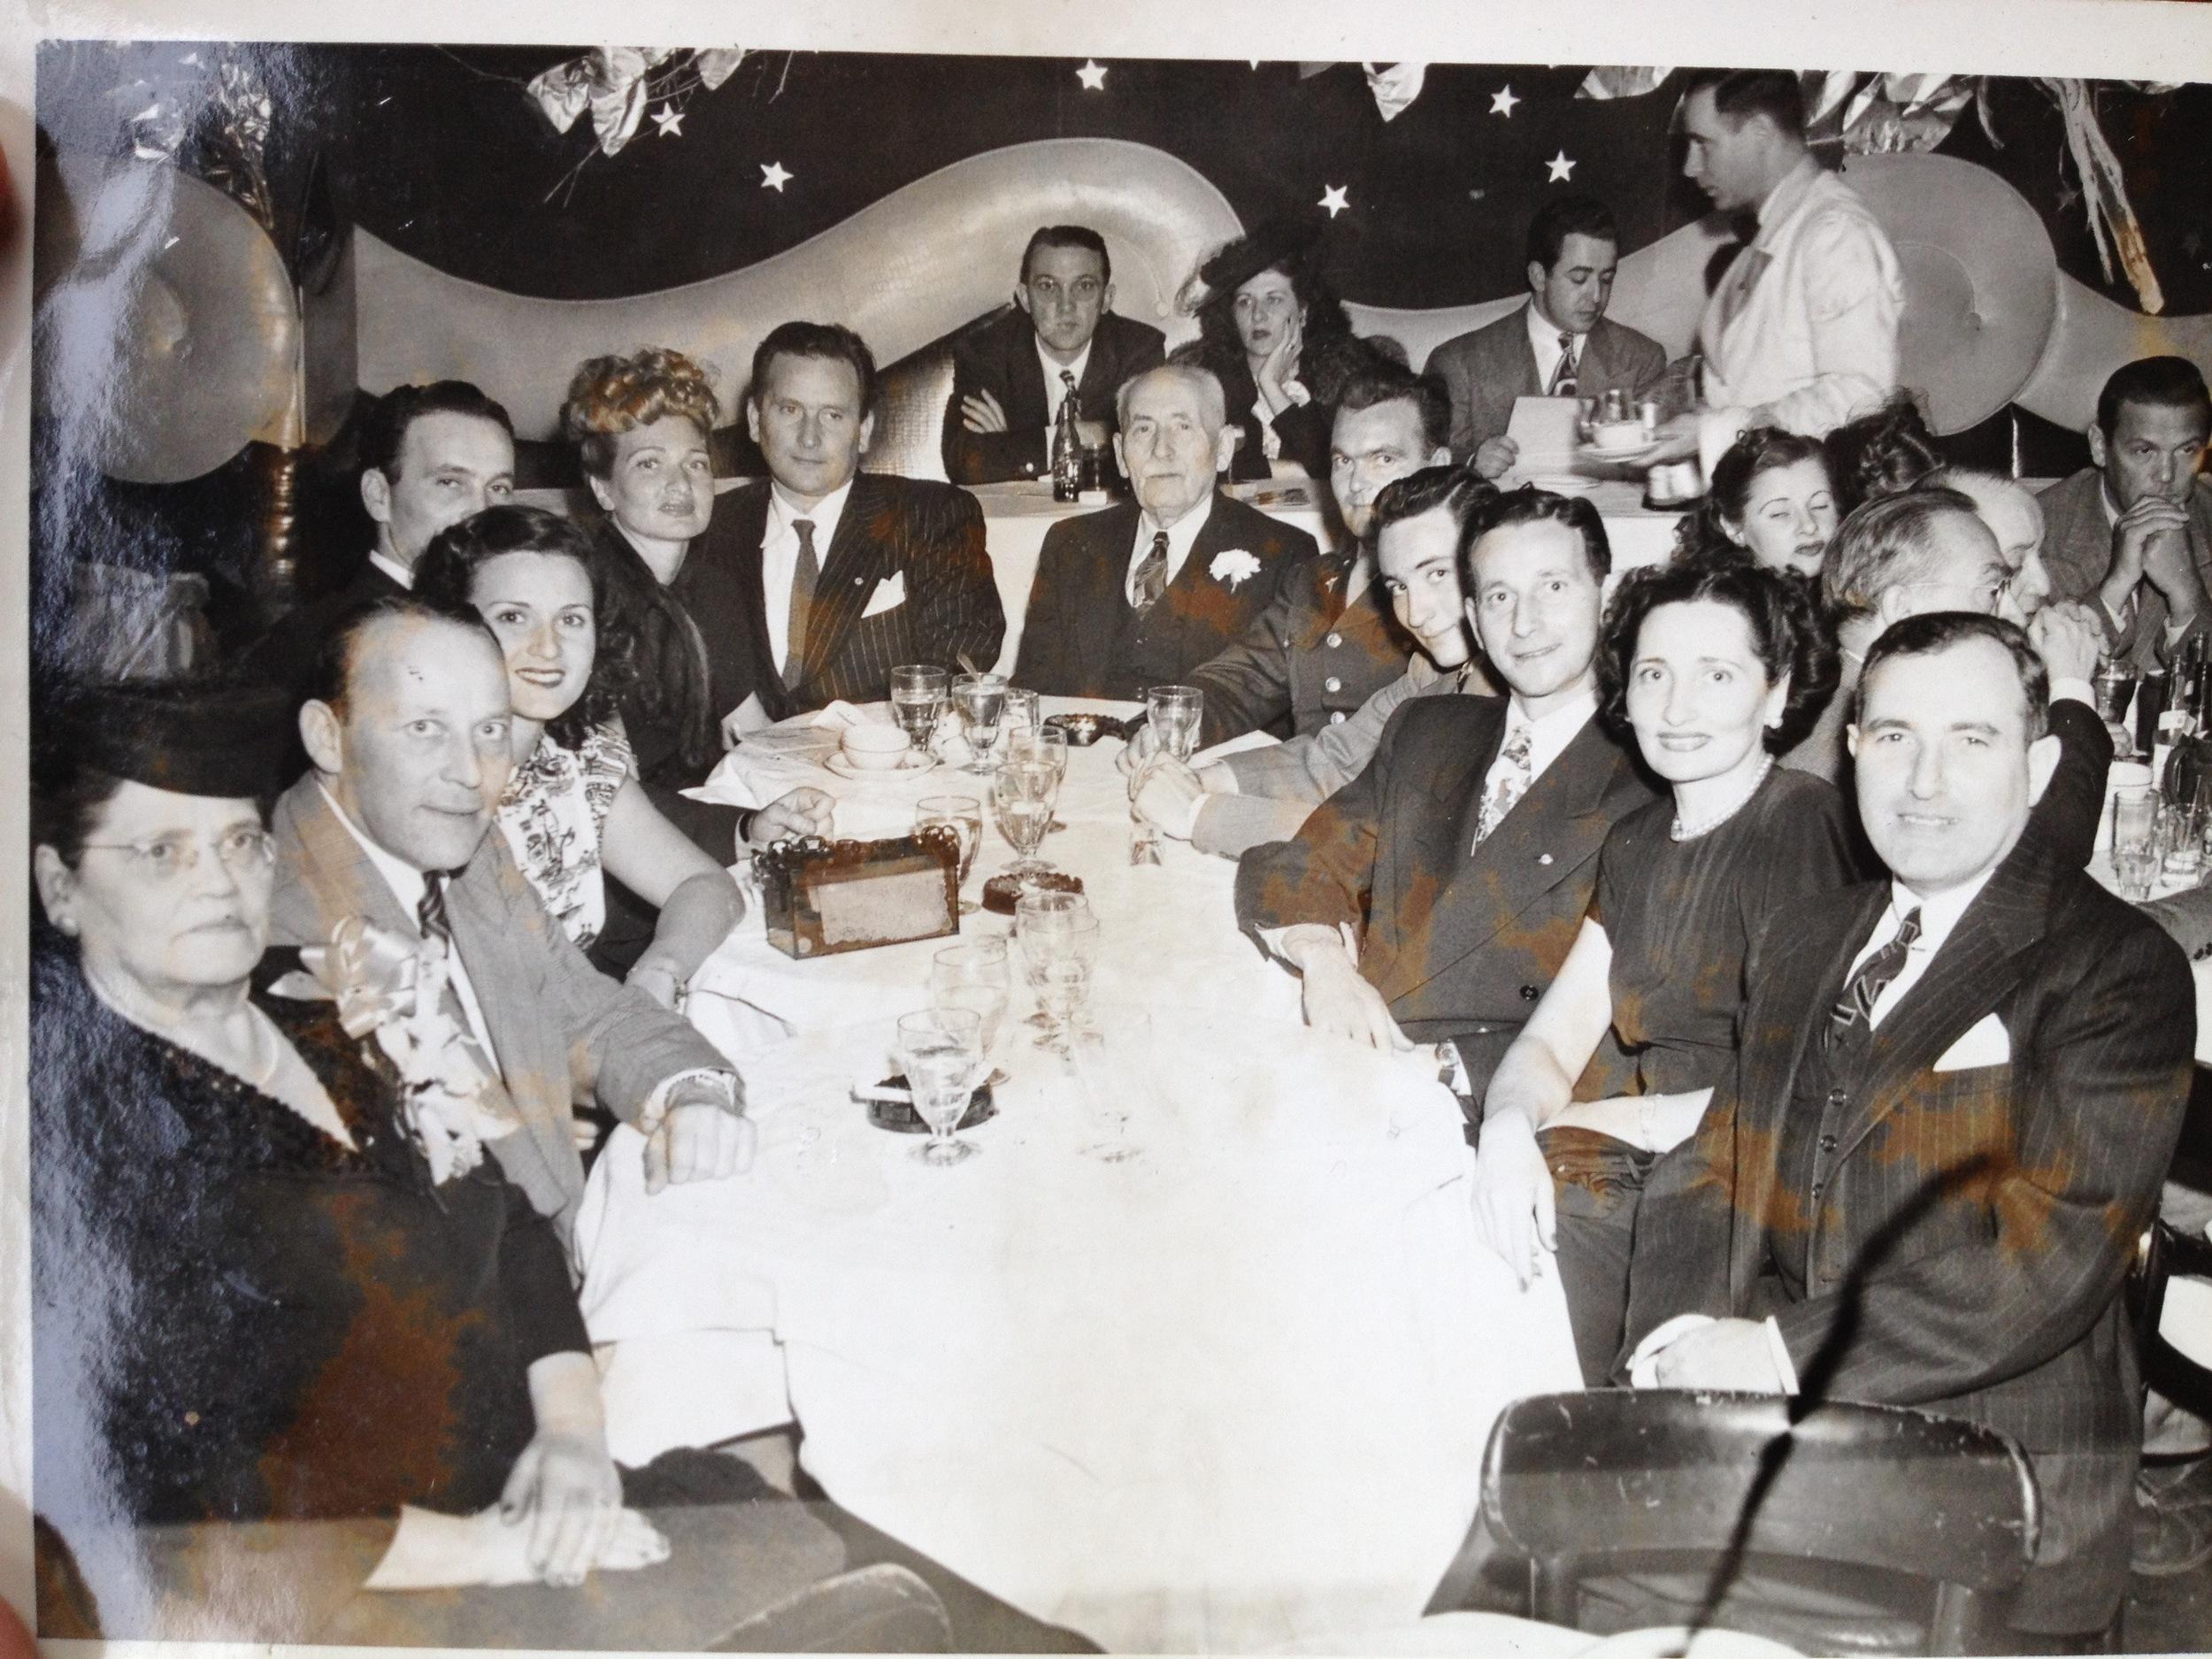 Leah, Mannie, Shirley, Stanley, Rose Black, Irving, Morris, Si, Bill Klausner, Oscar, Mickey and David Klausner